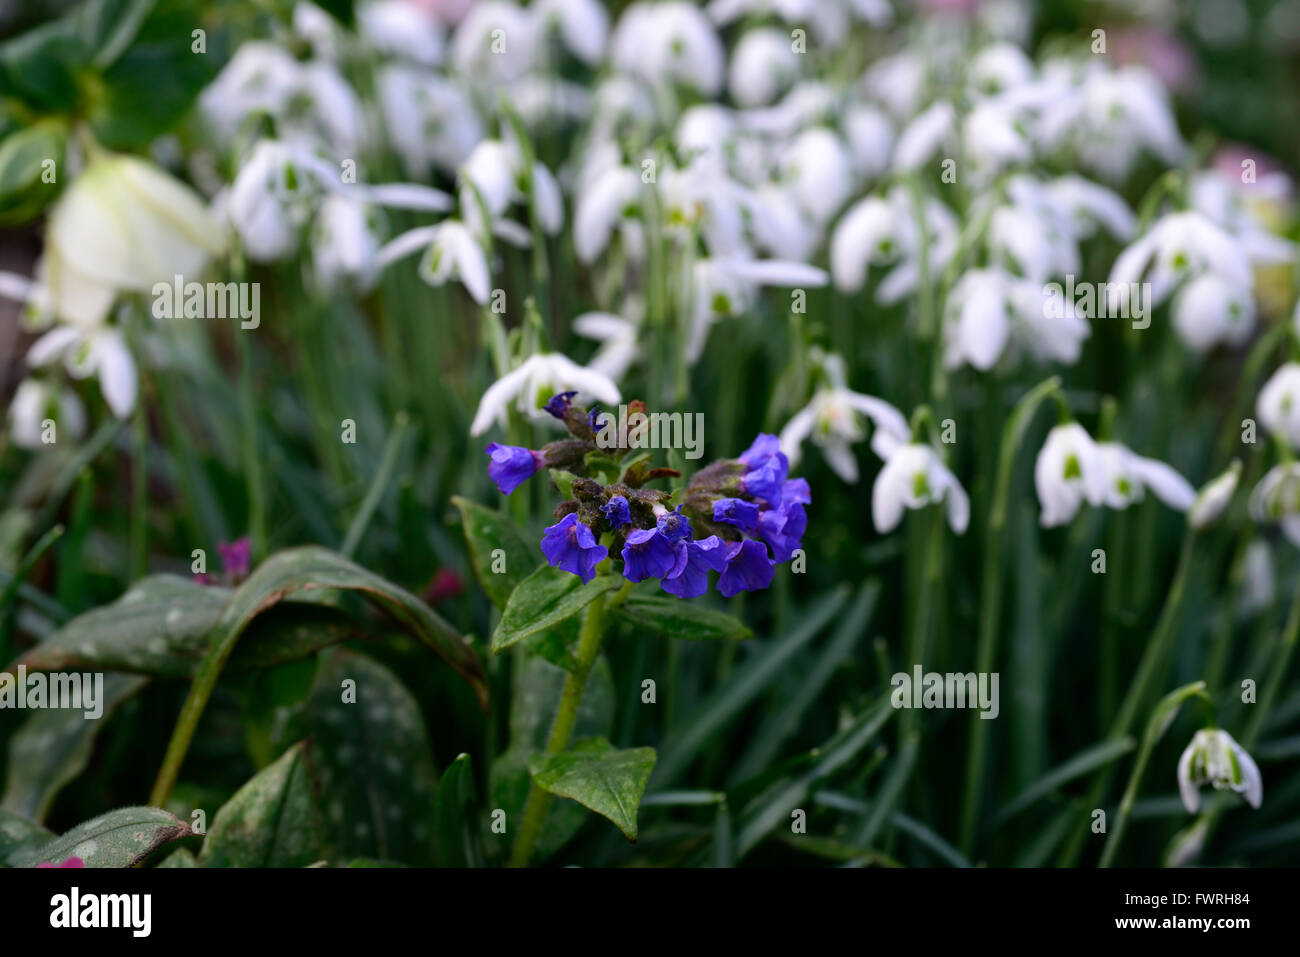 Pulmonaria blur ensign galanthus cordelia fleur fleurs printemps ...